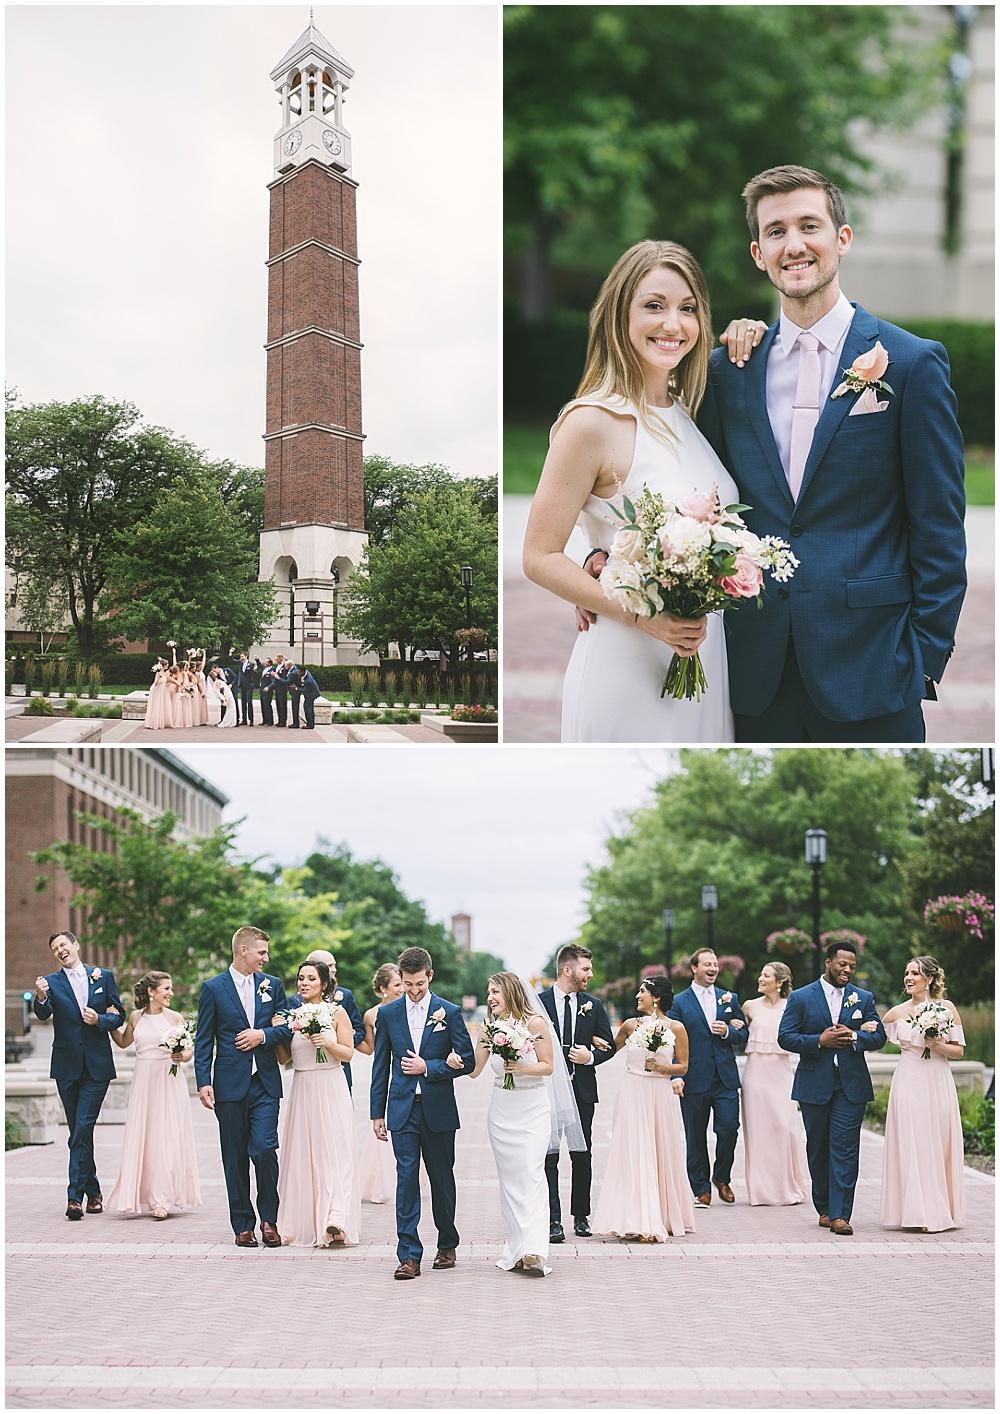 A garden-inspired Purdue University wedding | Purdue alumni wedding, shively club wedding, boilermaker wedding, blush wedding, campus portraits, bridal party portraits, blush bridesmaid dresses